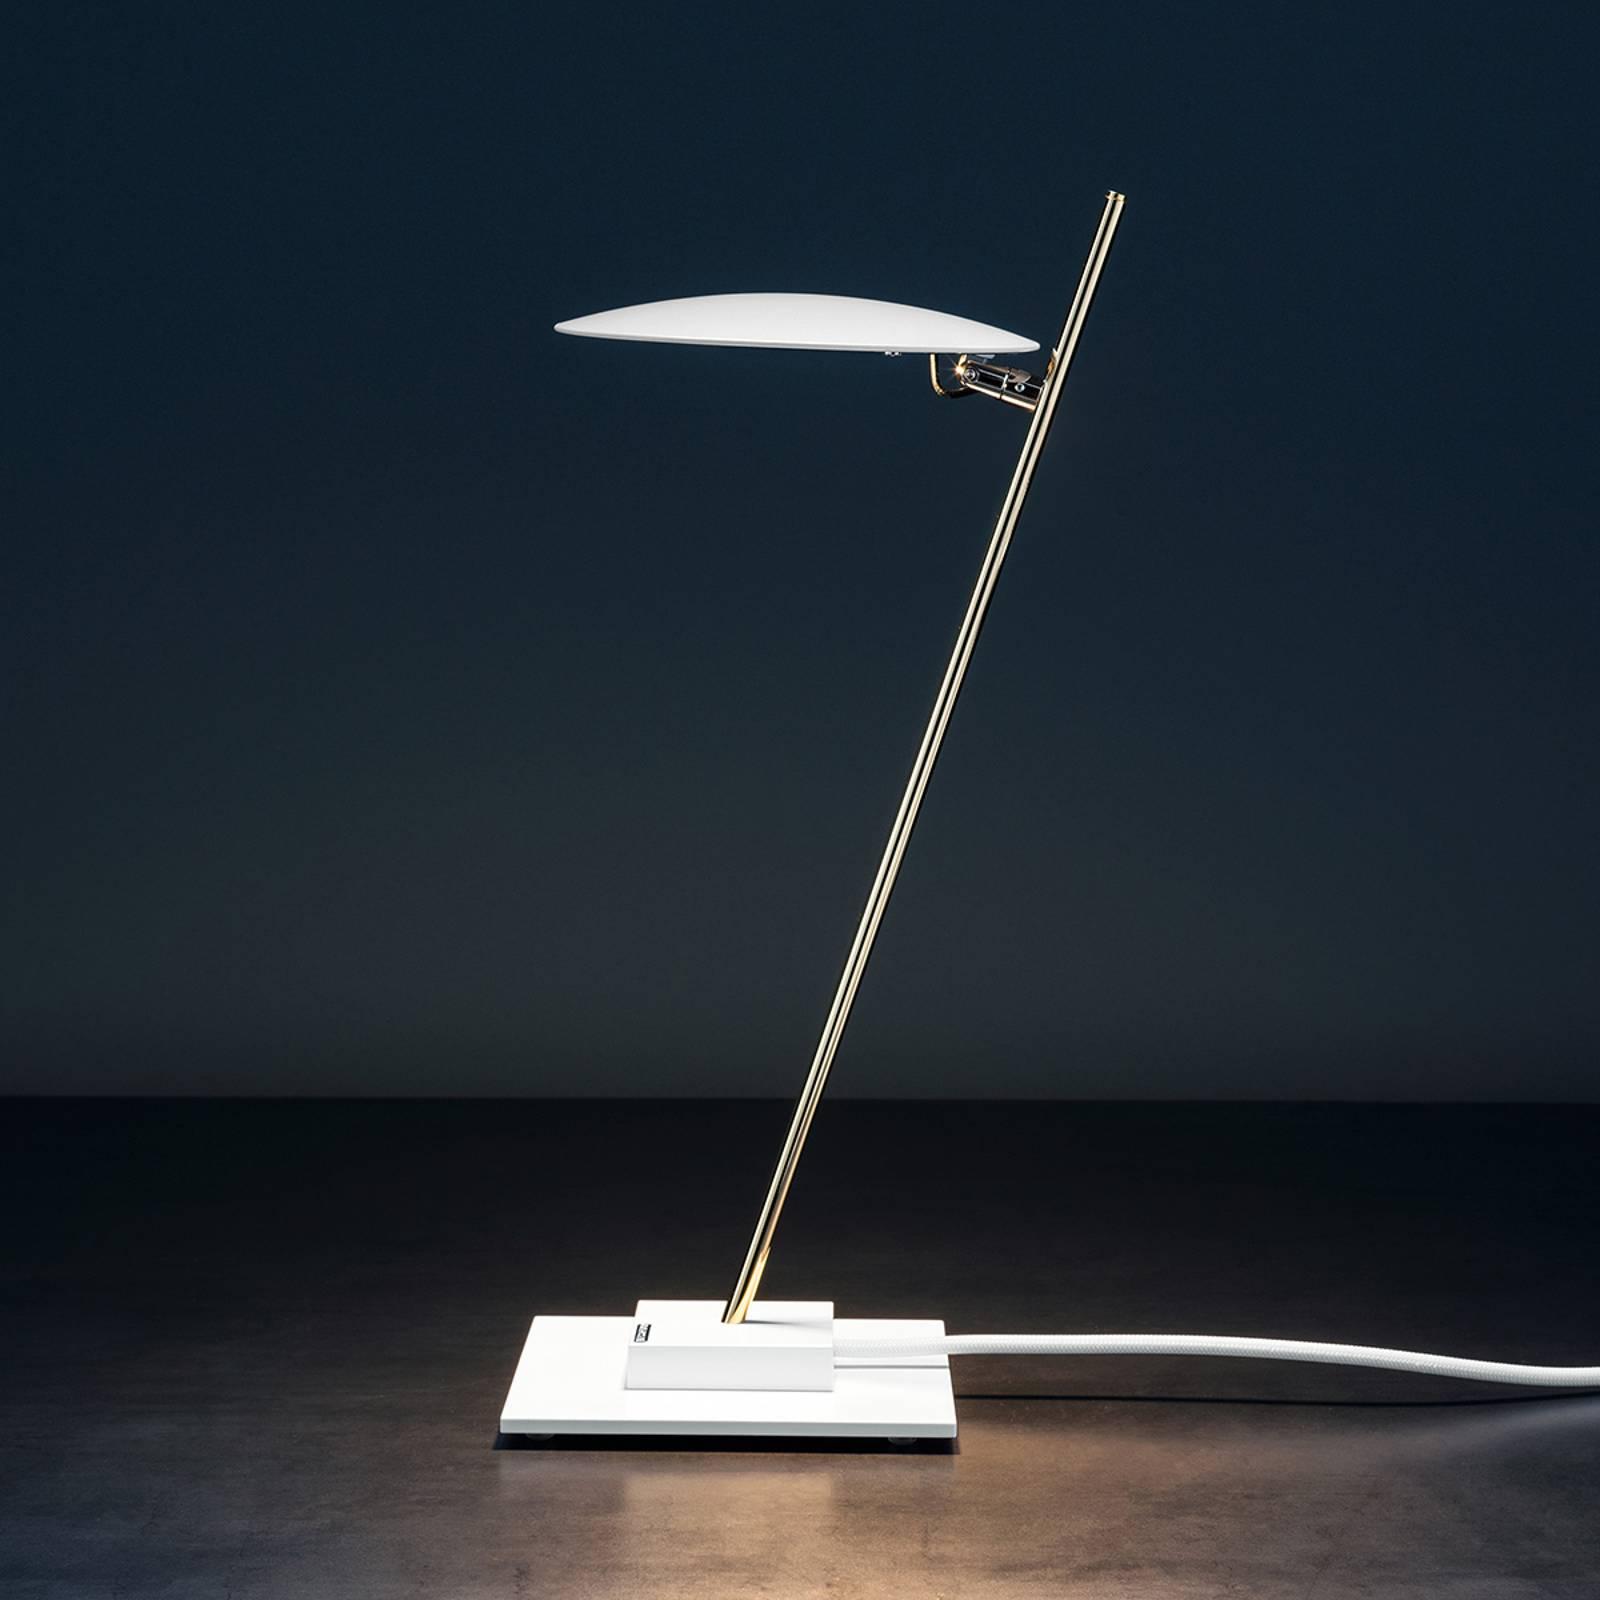 Catellani & Smith Lederam LT15 LED-Tischleuchte